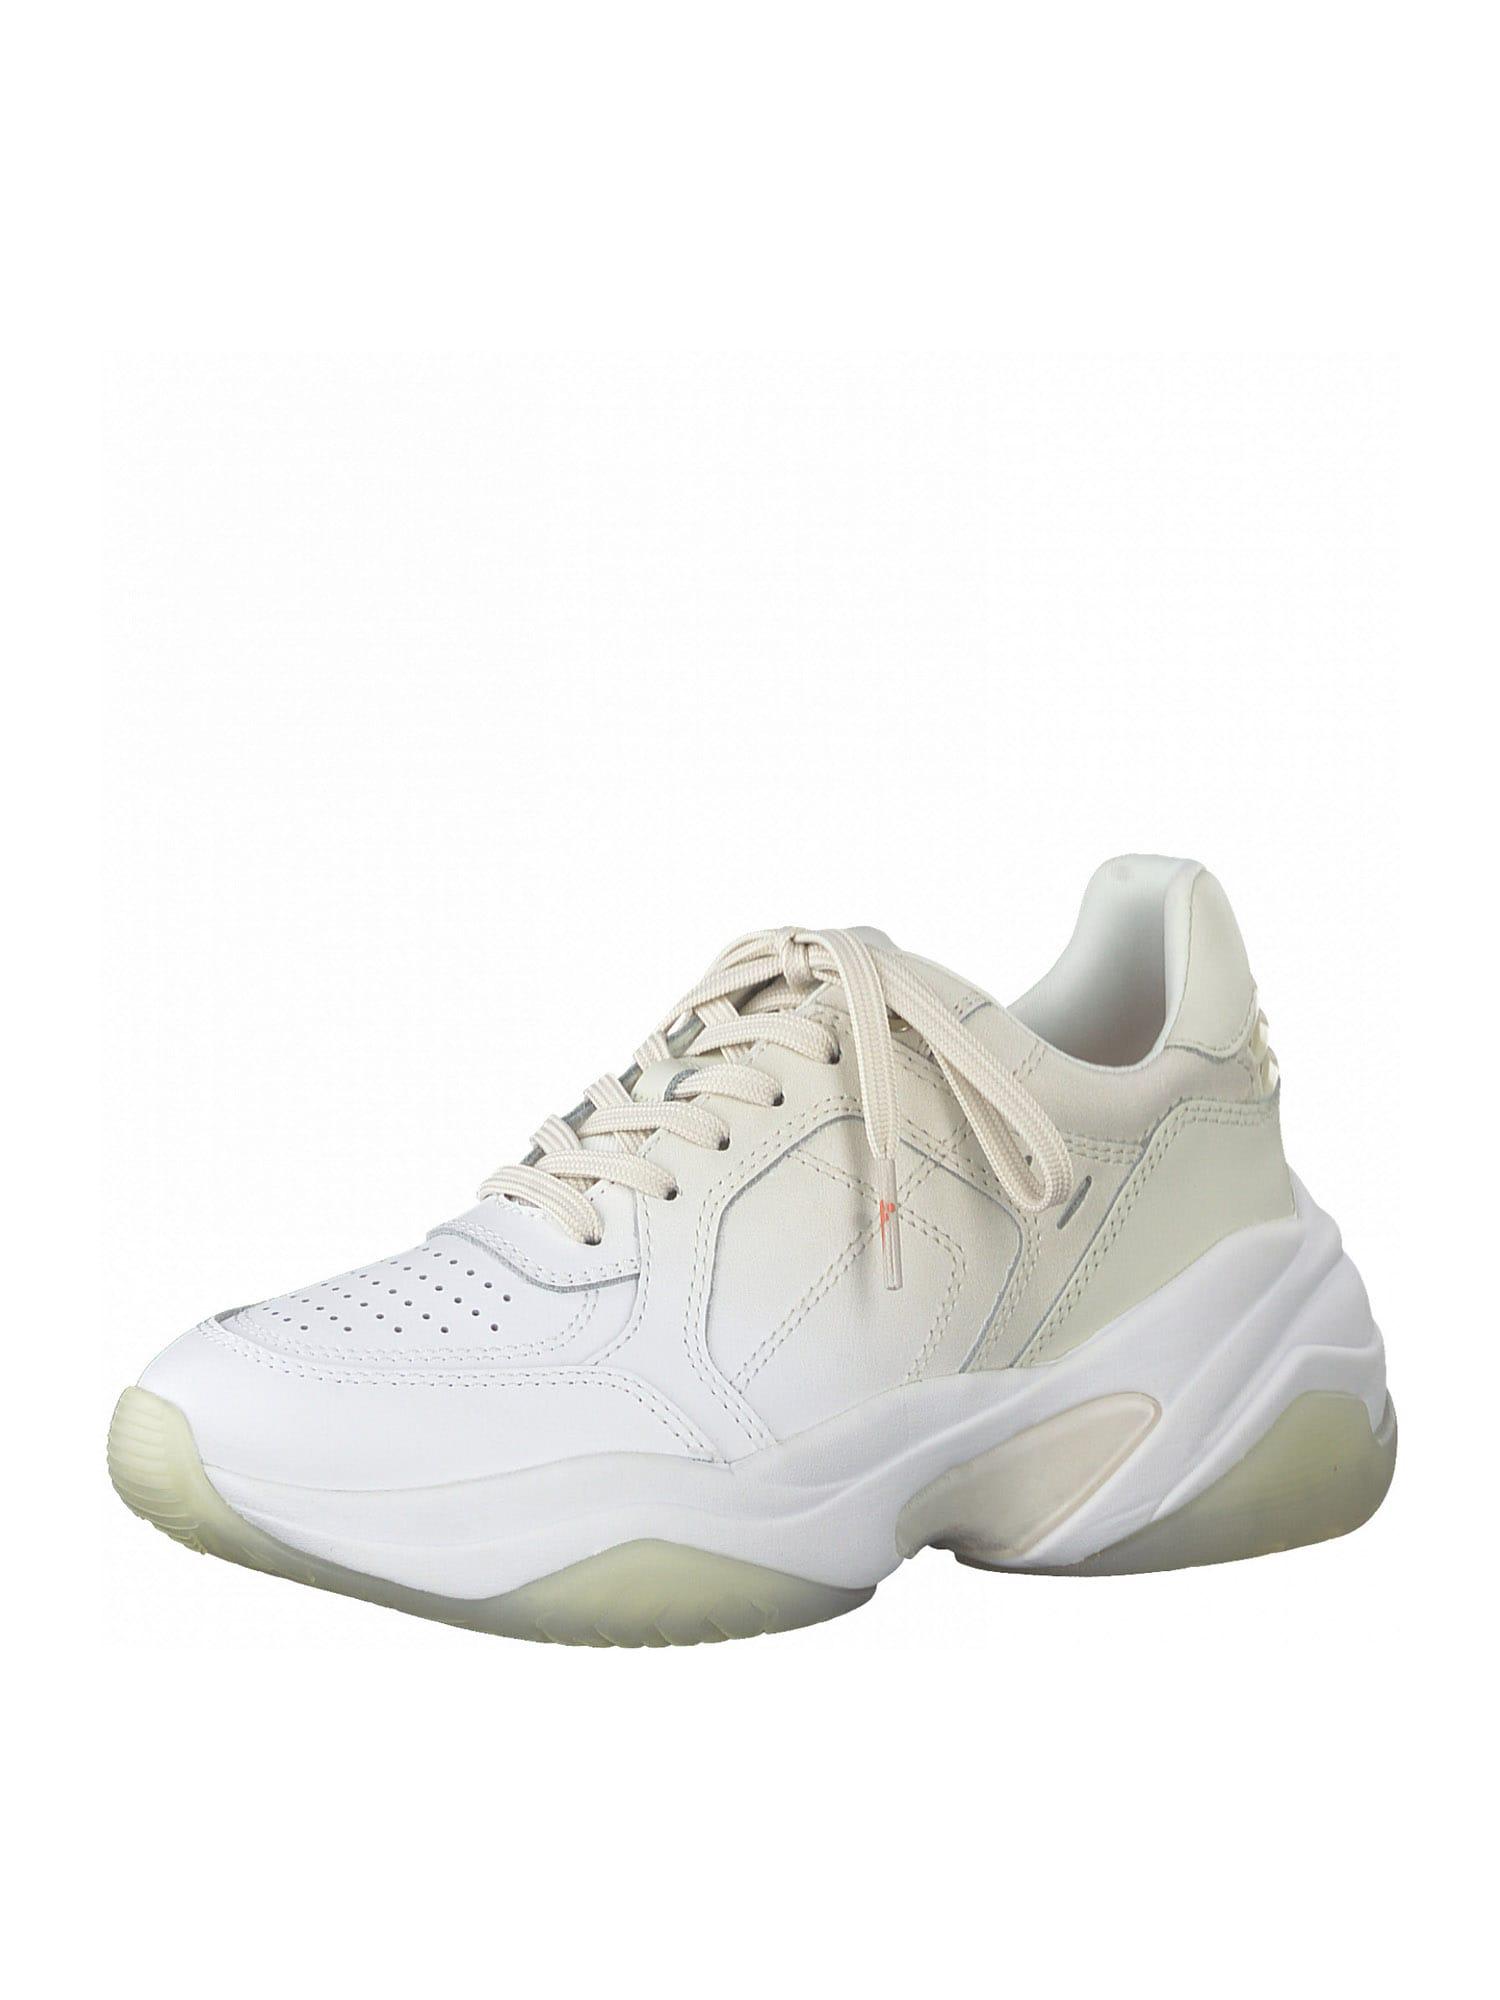 Tamaris Fashletics Baskets basses  - Blanc - Taille: 42 - female